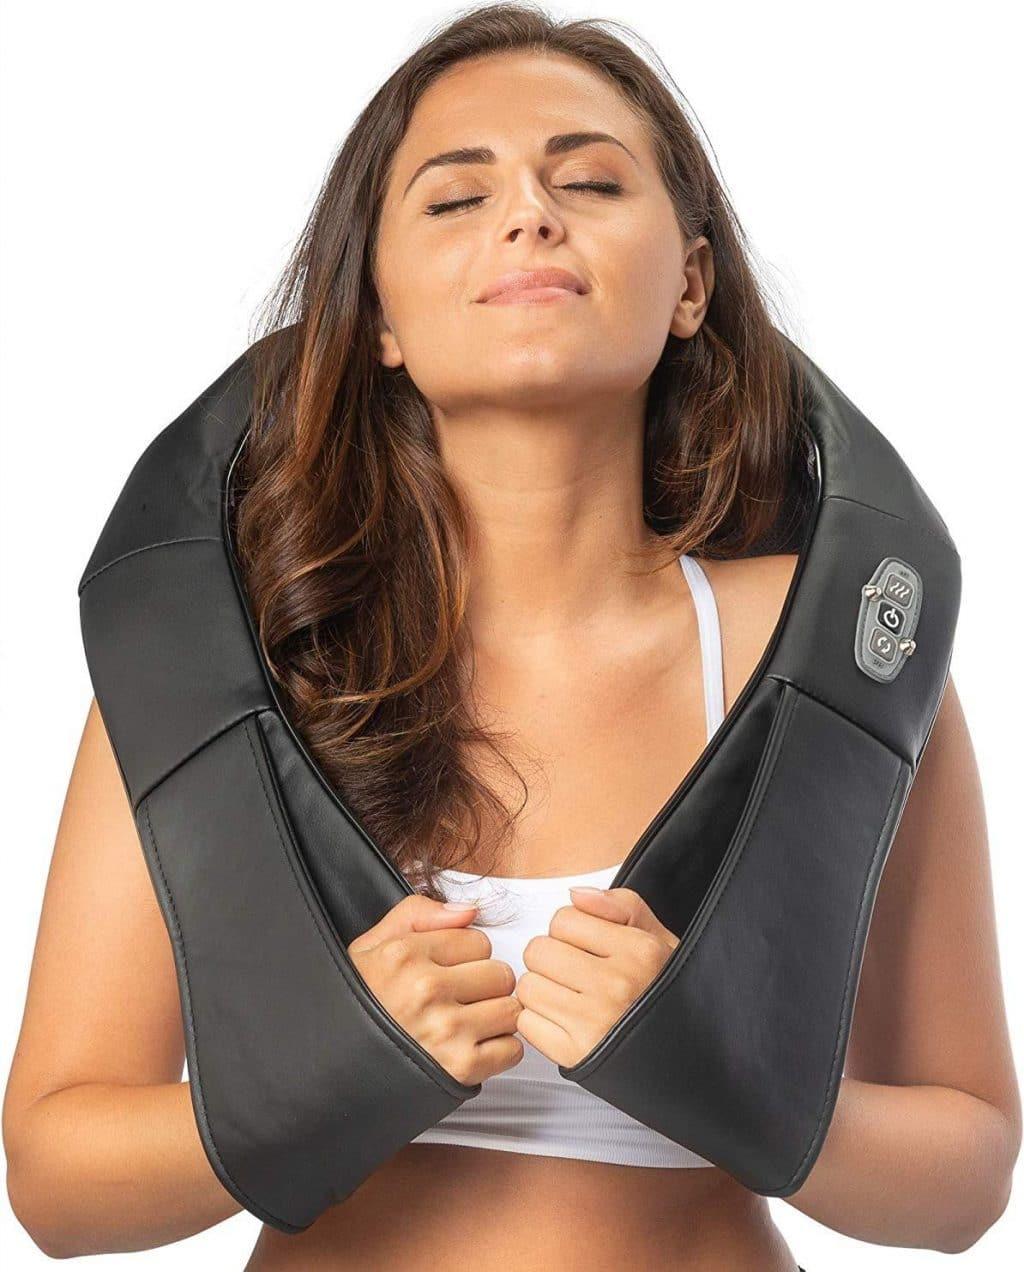 Belmint Shiatsu Massager With Heat